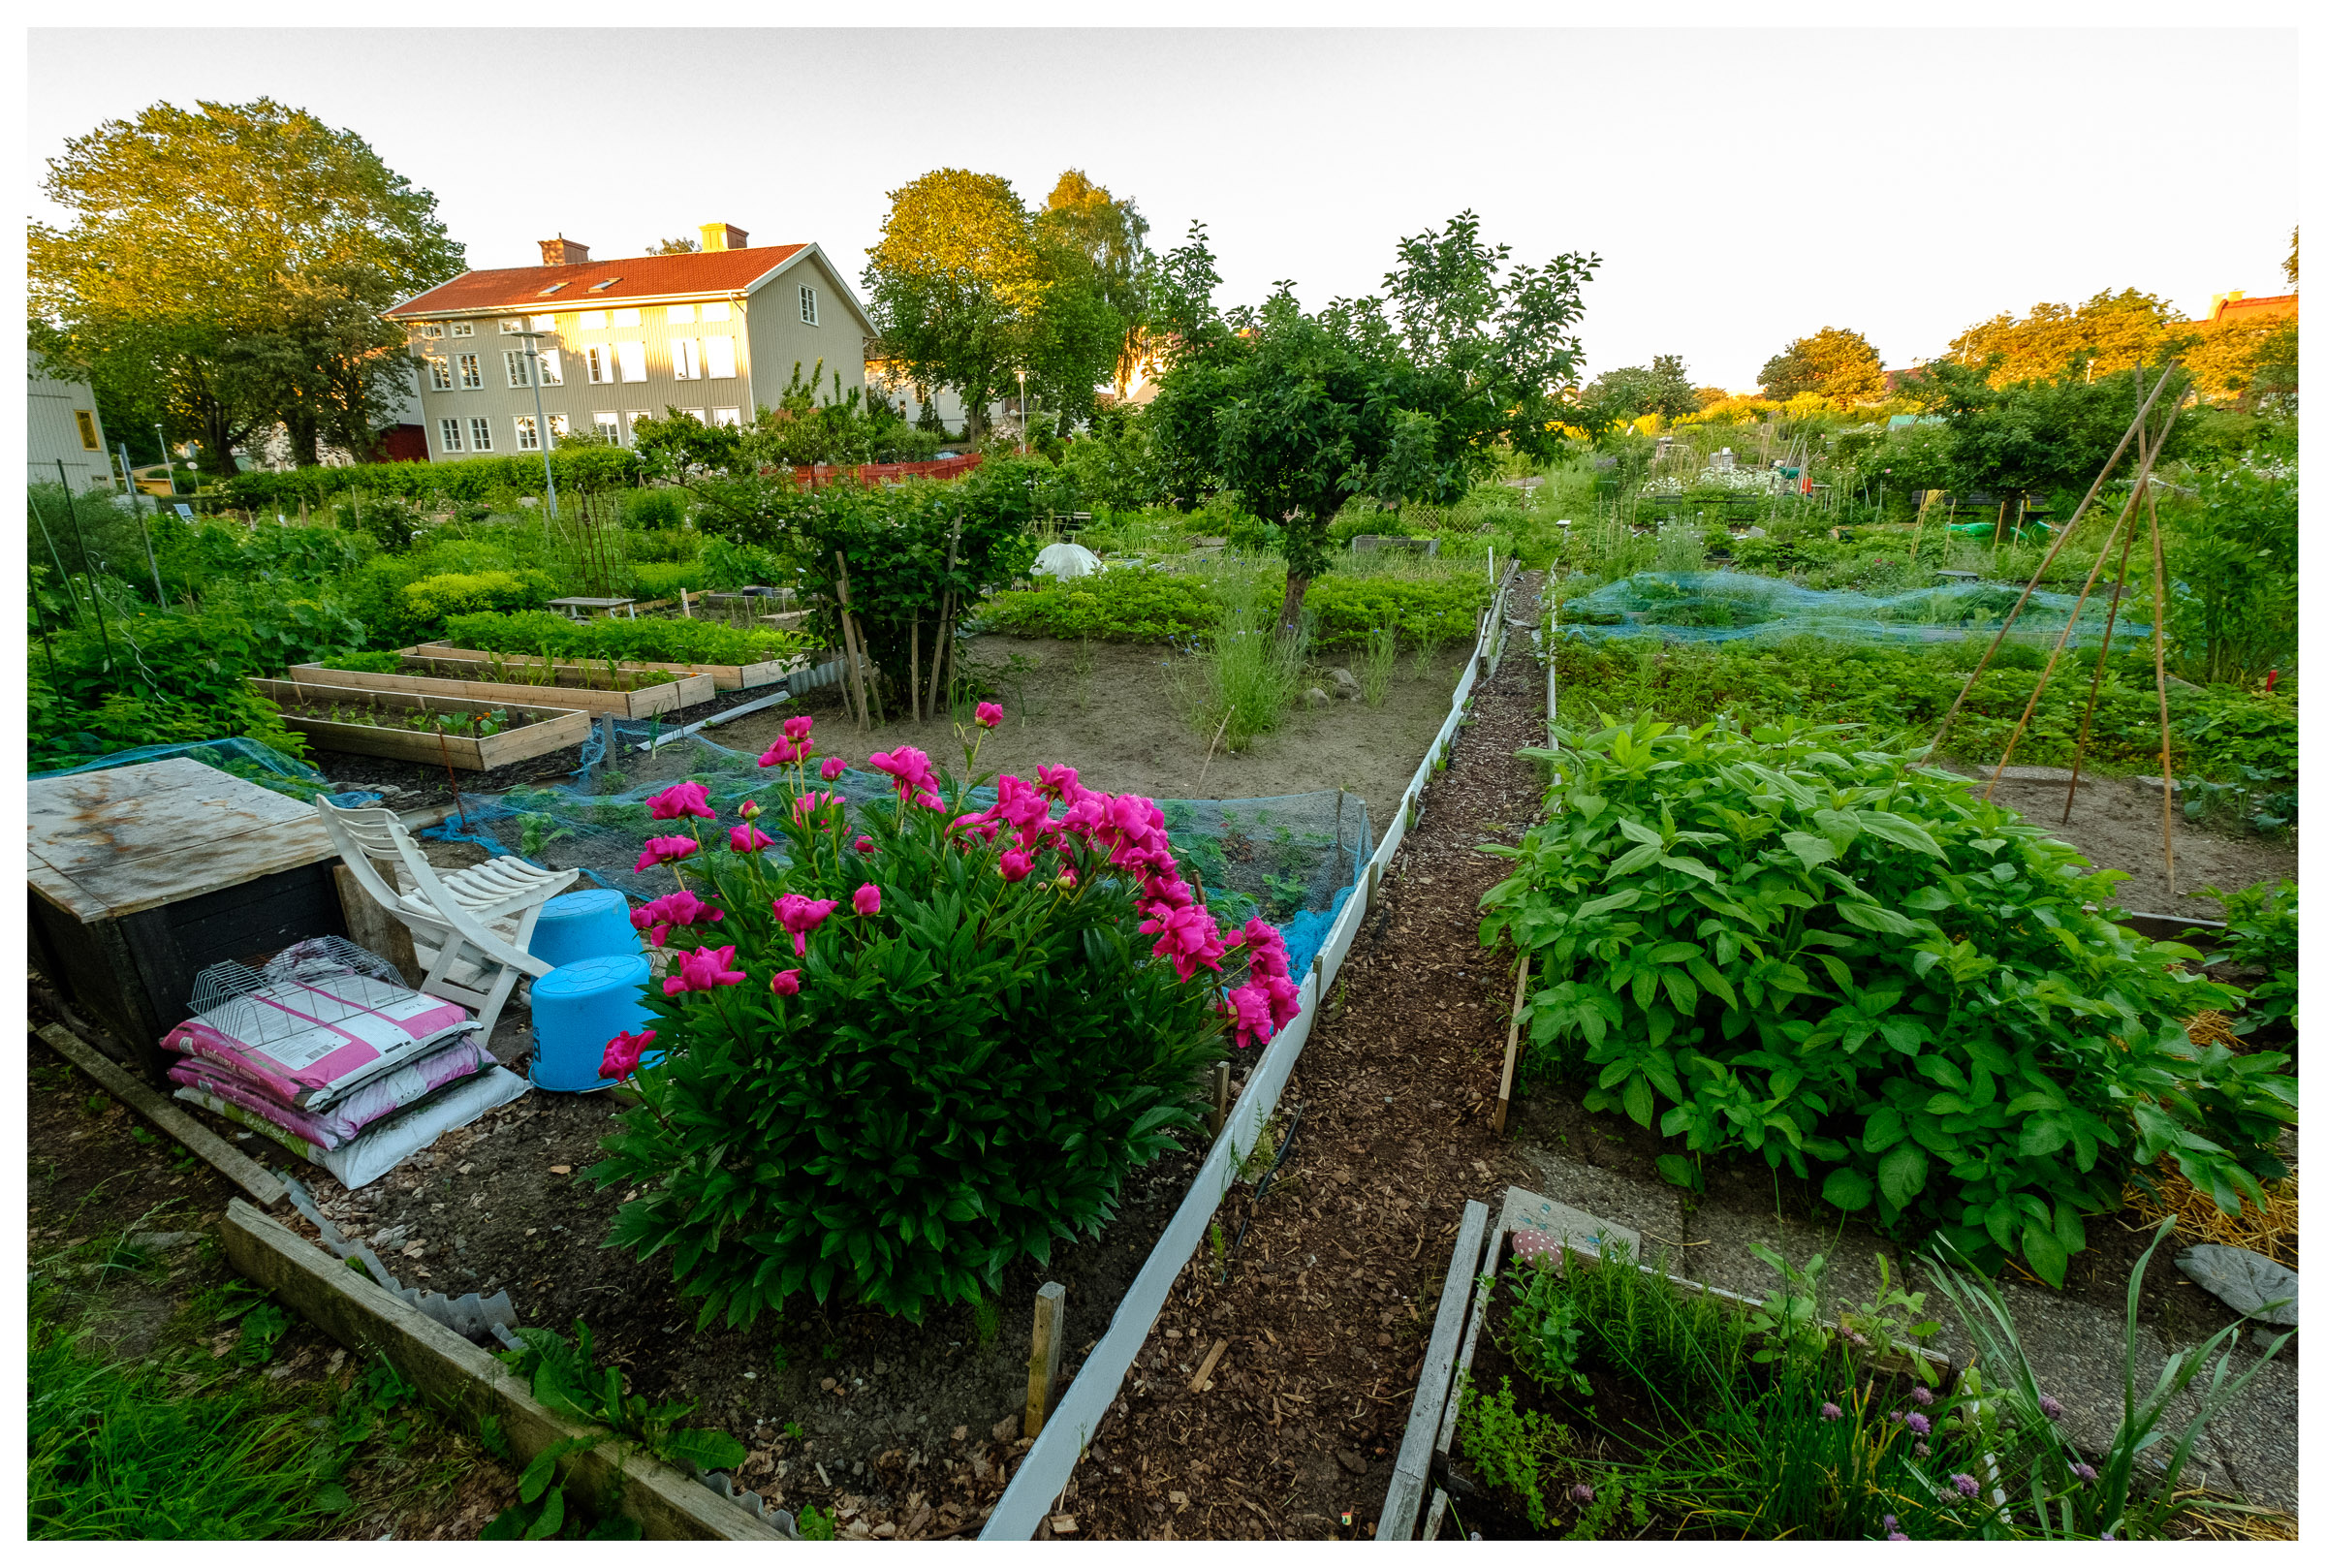 Vegetable and flower gardens by Slottsberget